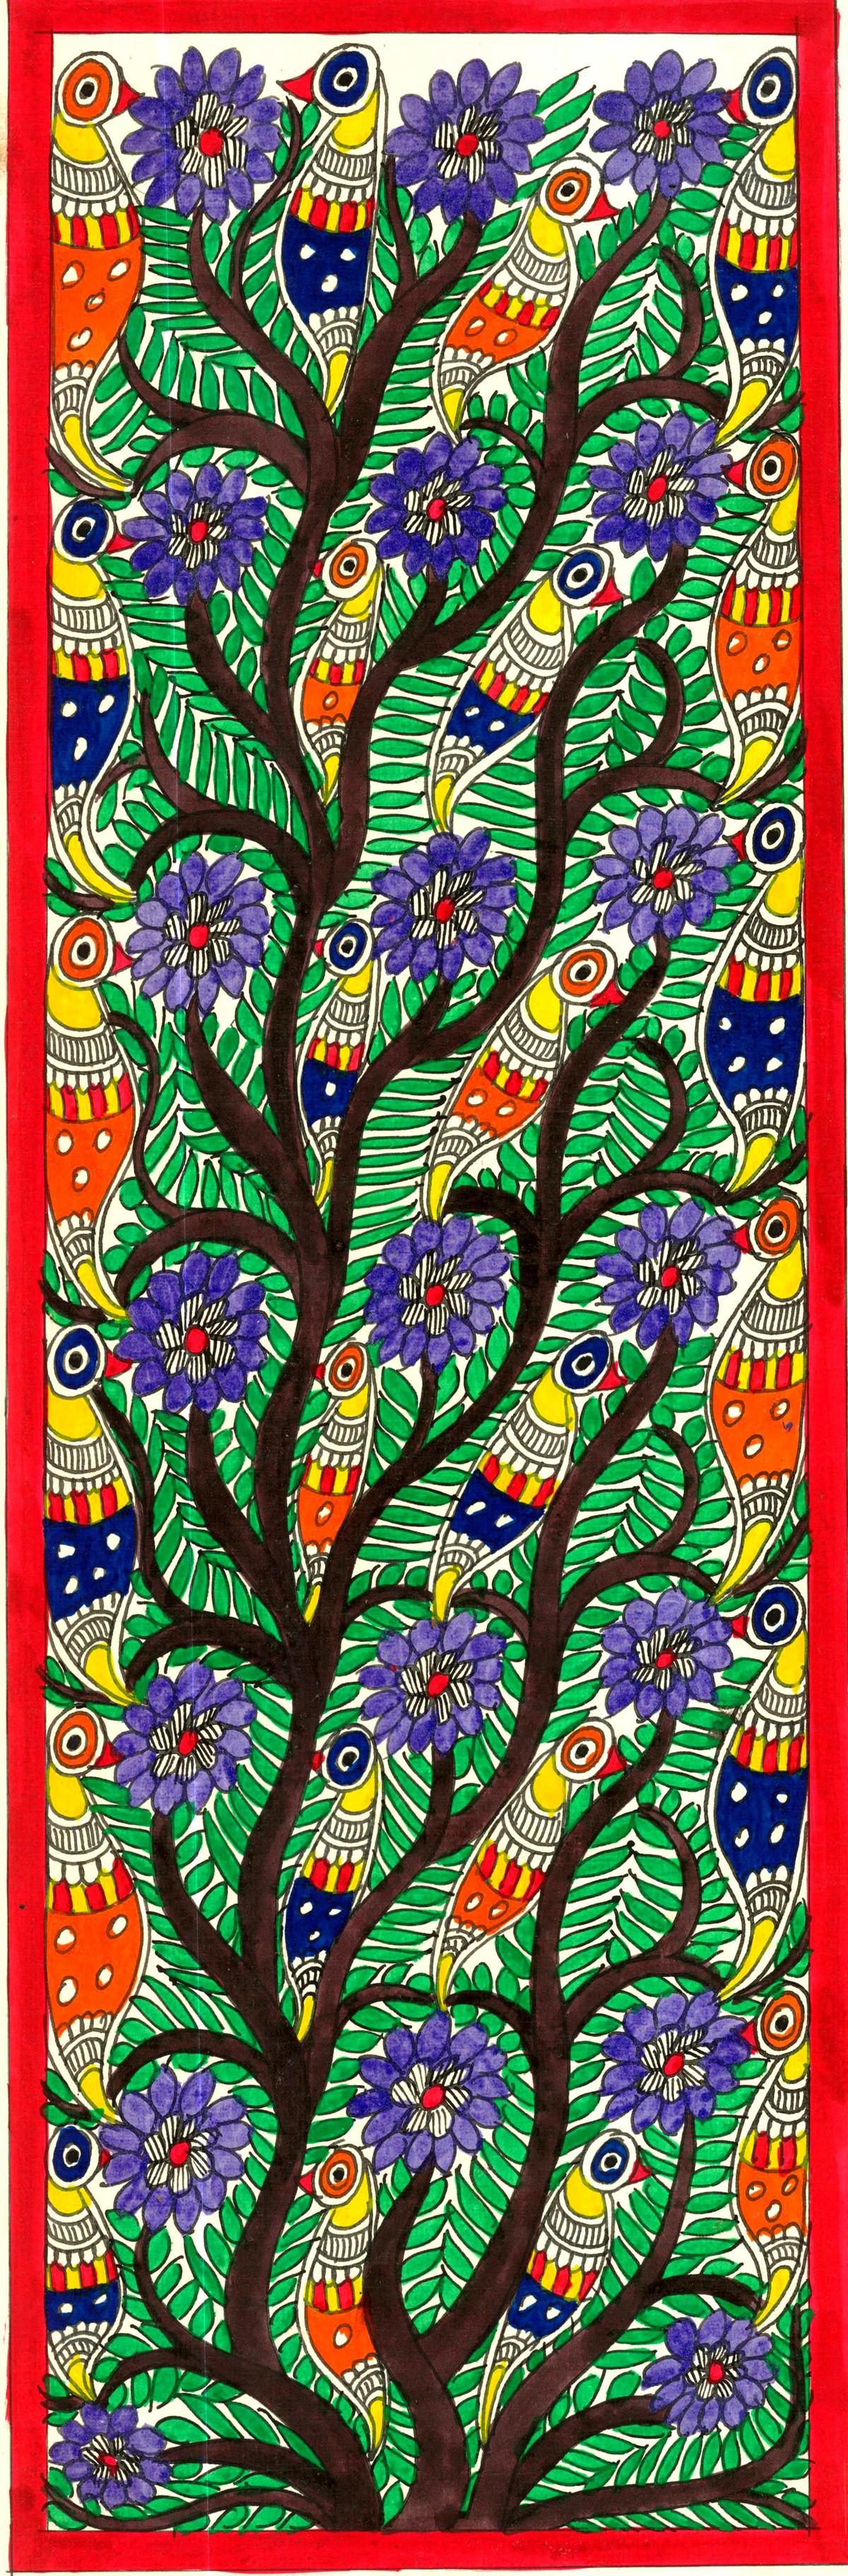 Tree of Life by artist Unknown Artist – Folk, Drawing | Noorbank ...